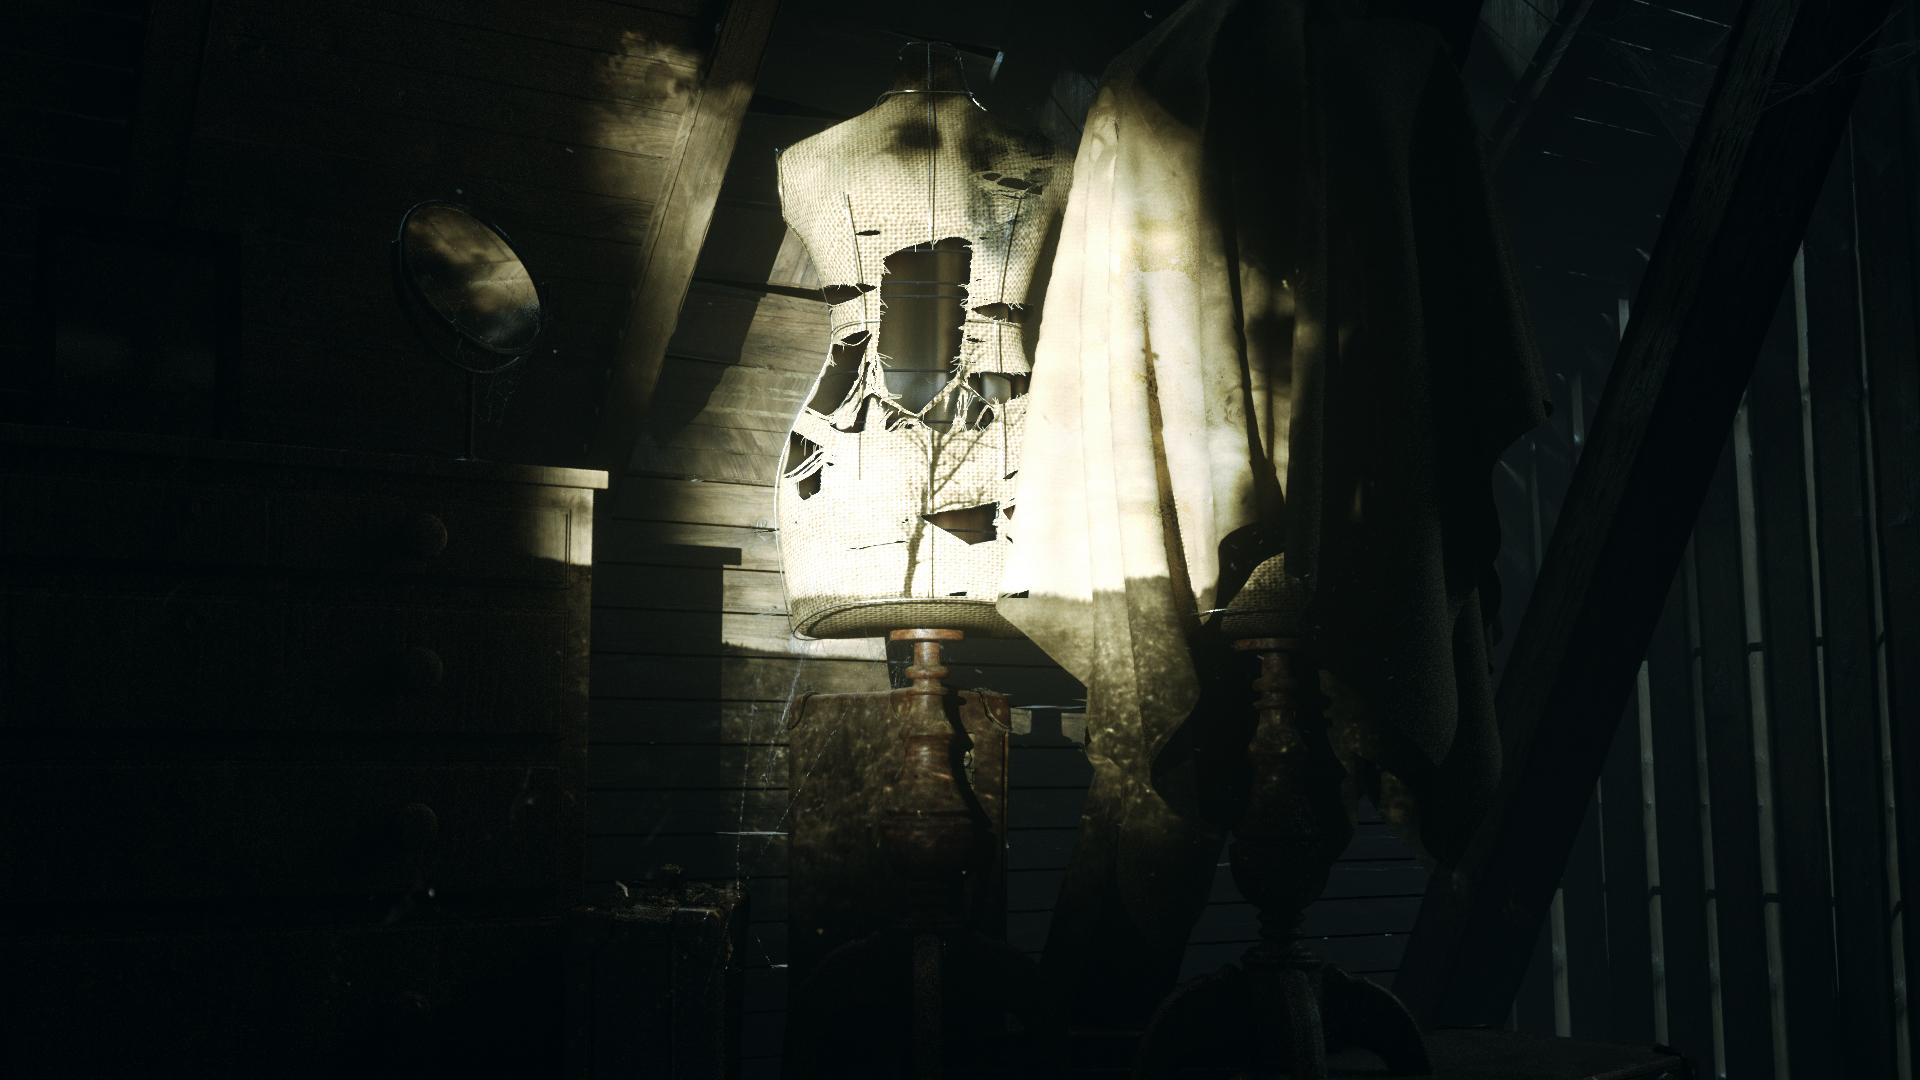 Attic_Projection_Manequin_v01